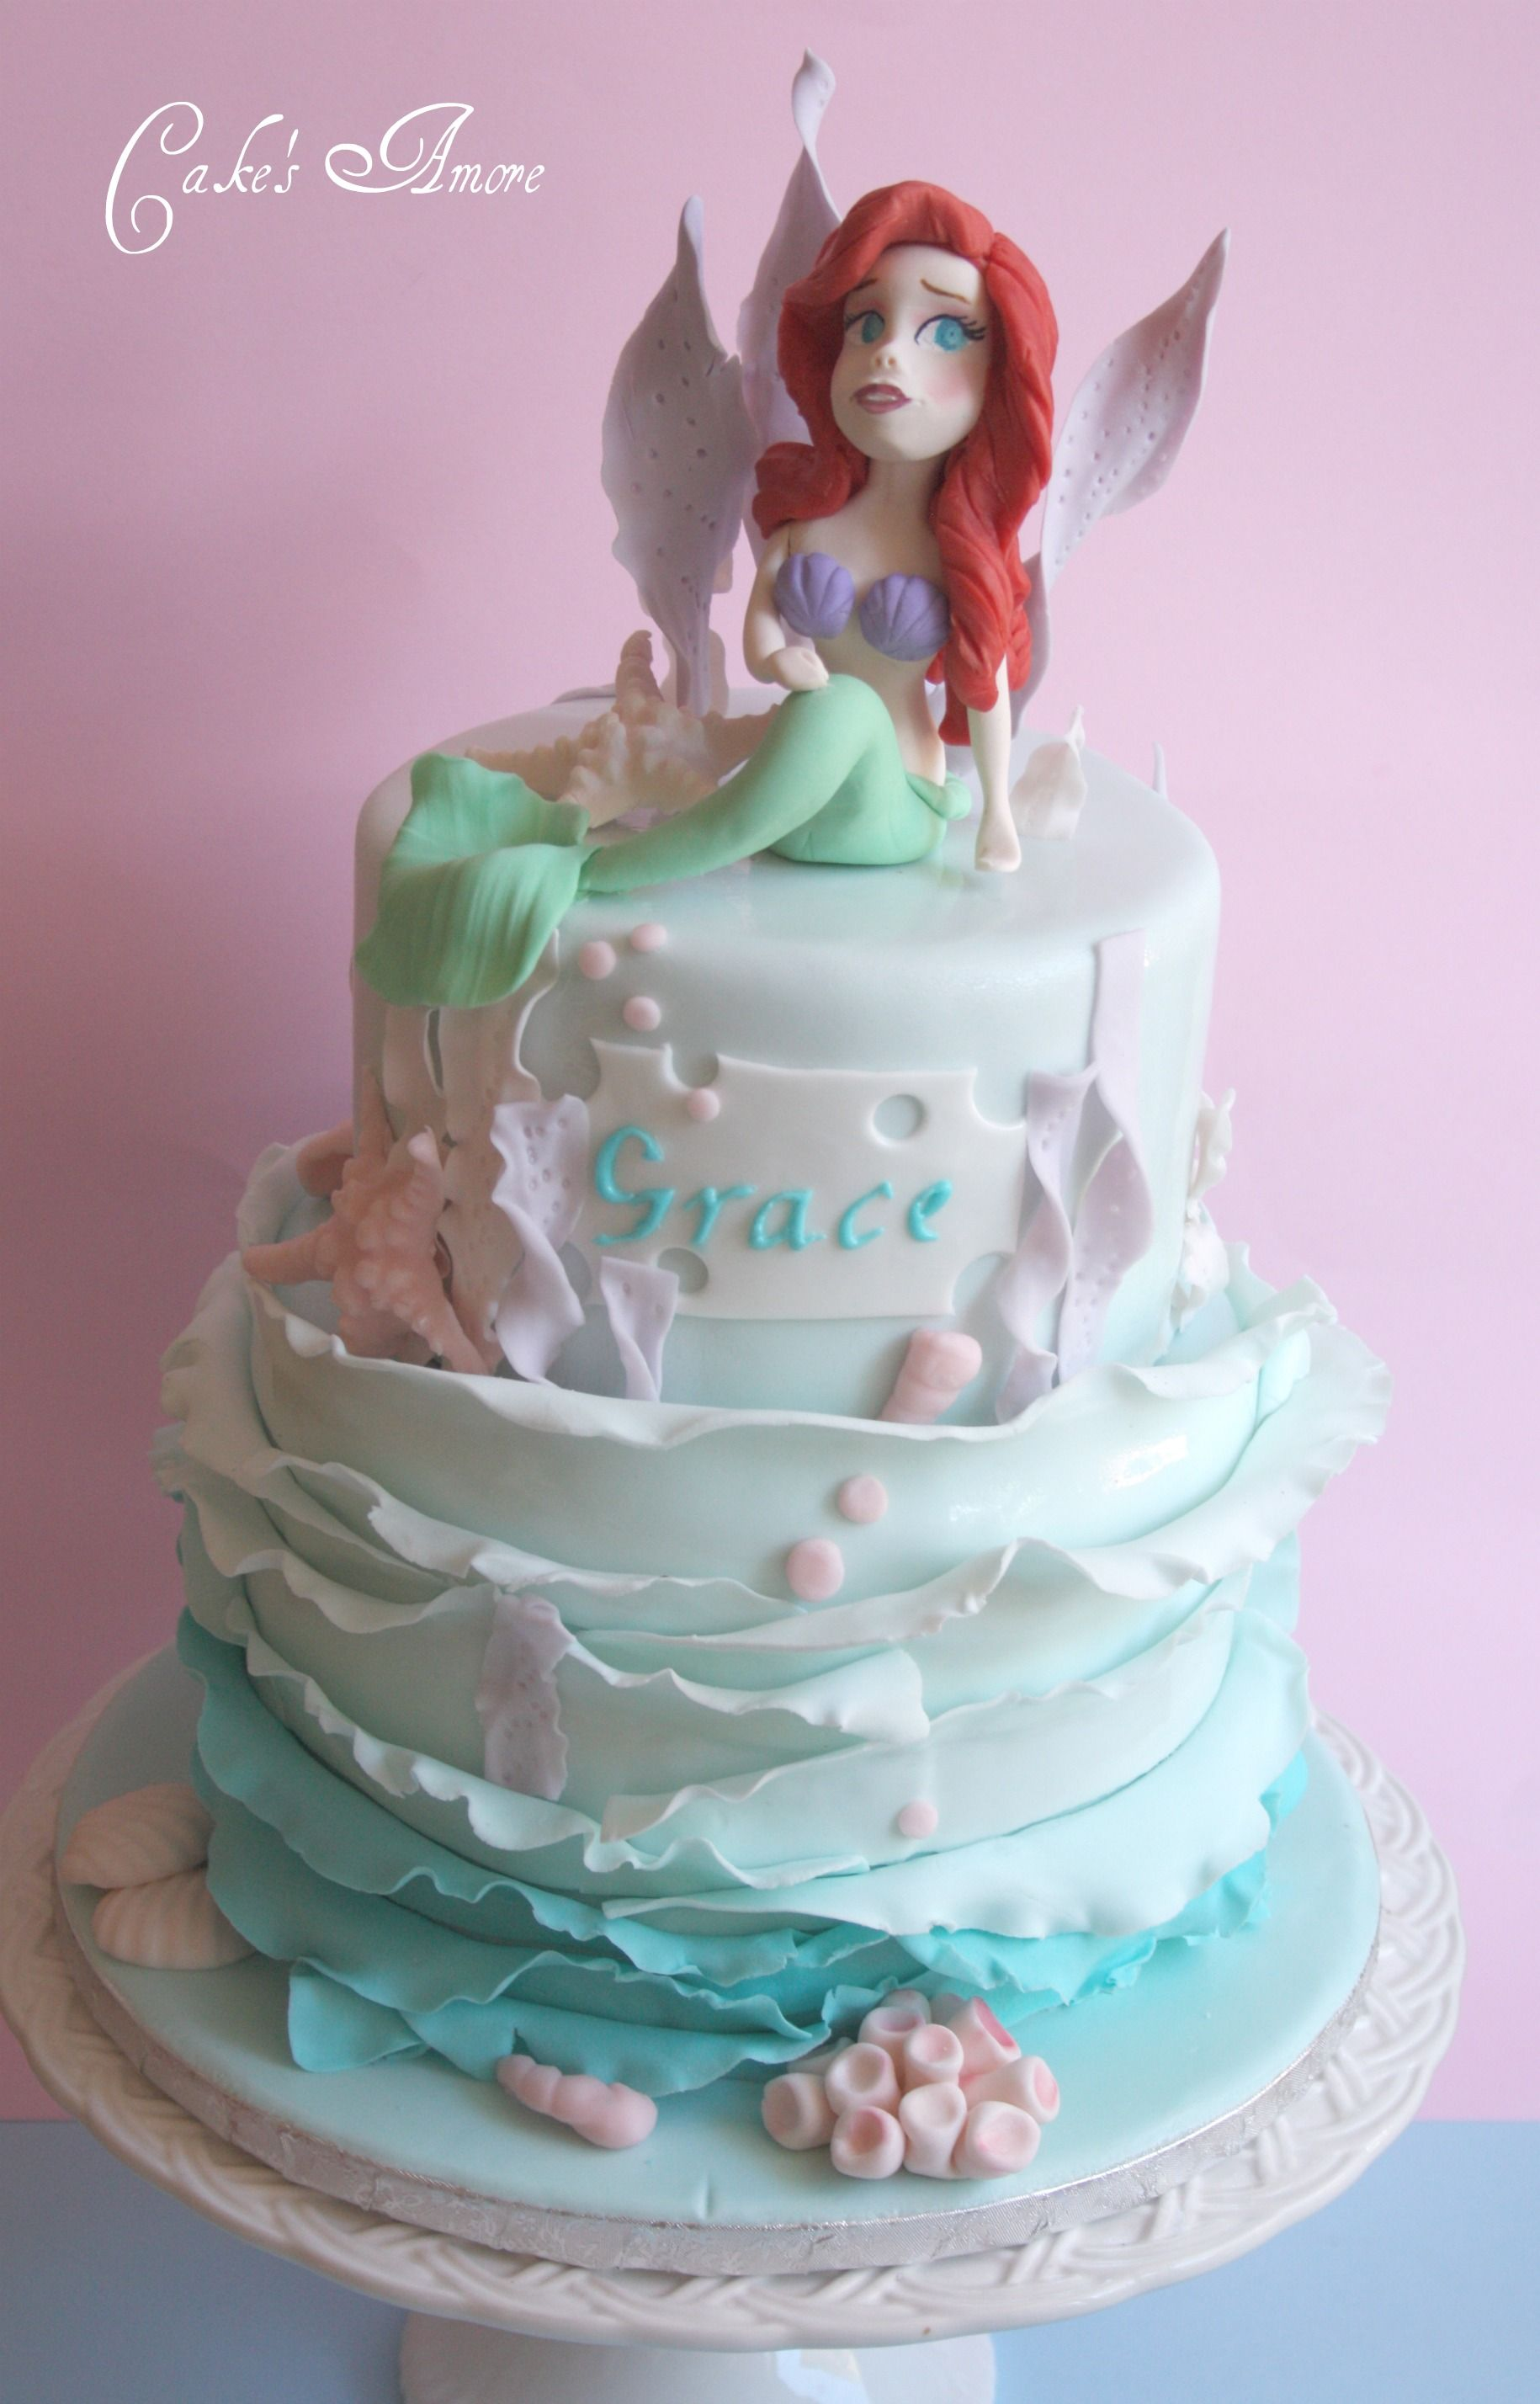 Ariel Cake Decorations Ariel Cake Little Mermaid Pinterest Shells Cakes And Rocks